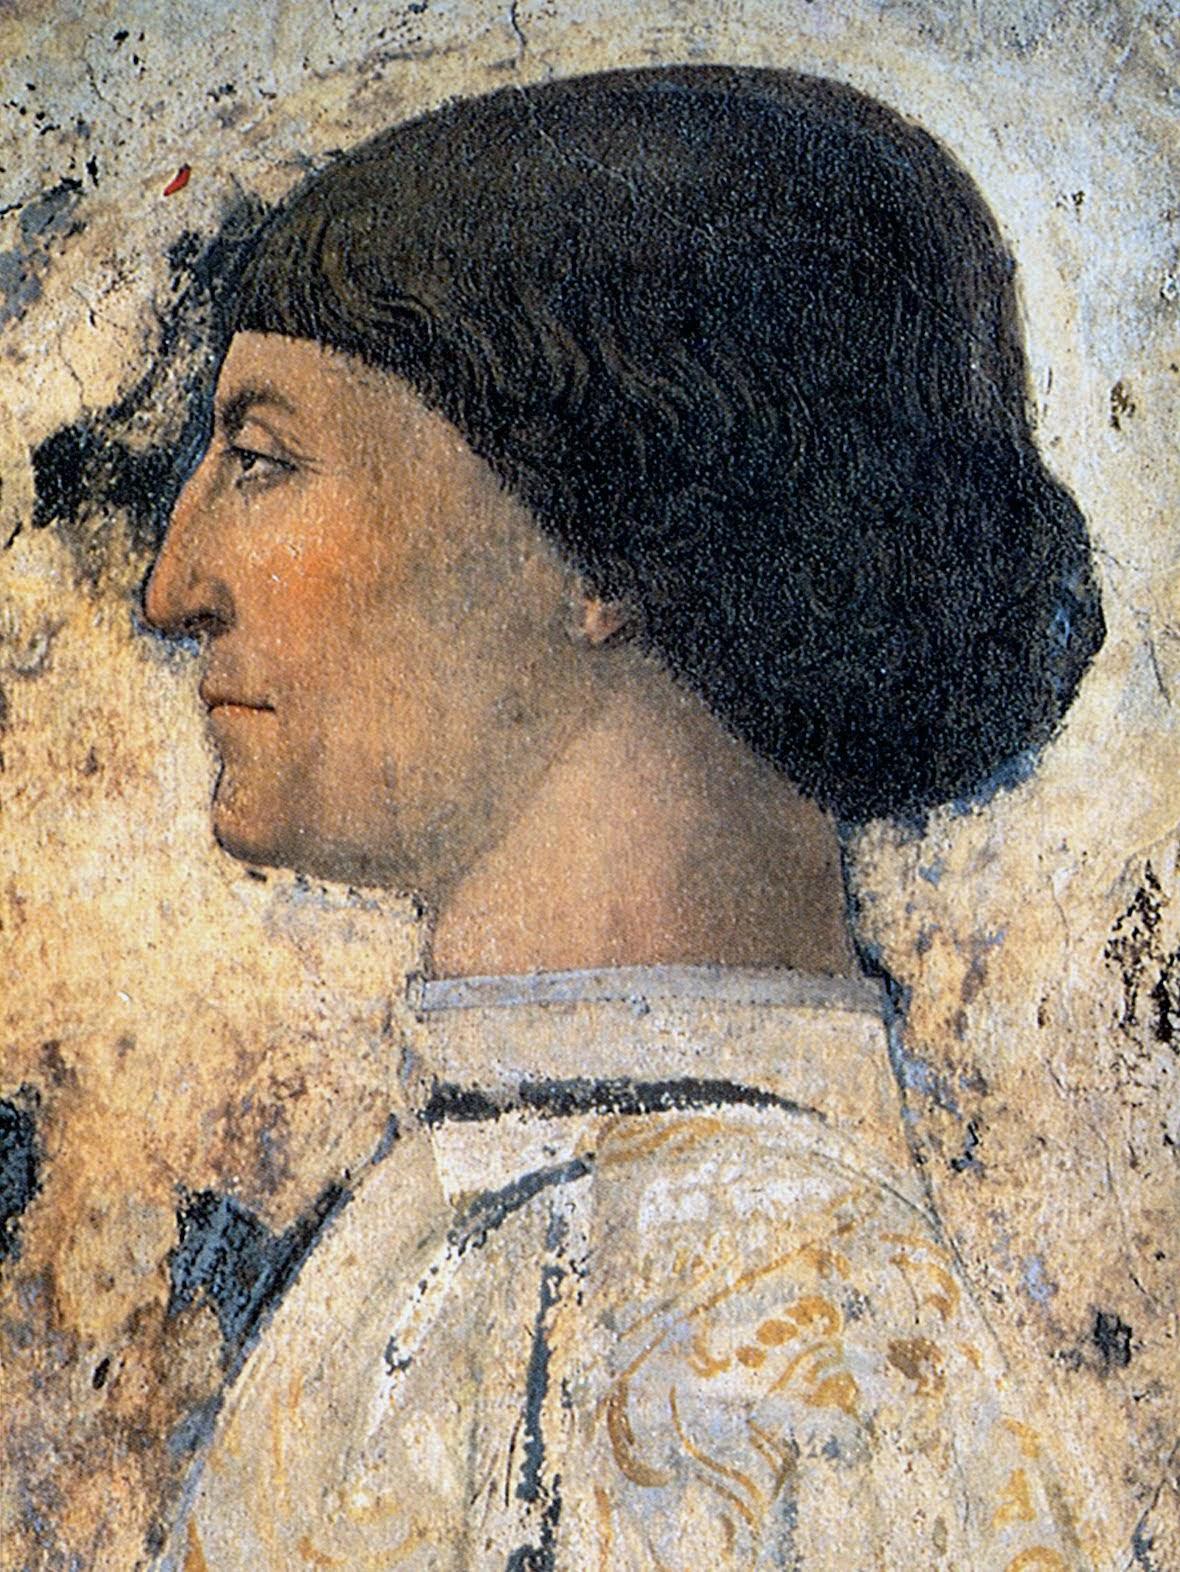 Piero della Francesca, Sigismondo Pandolfo Malatesta in preghiera davanti a san Sigismondo, 1451, particolare San Sigismondo